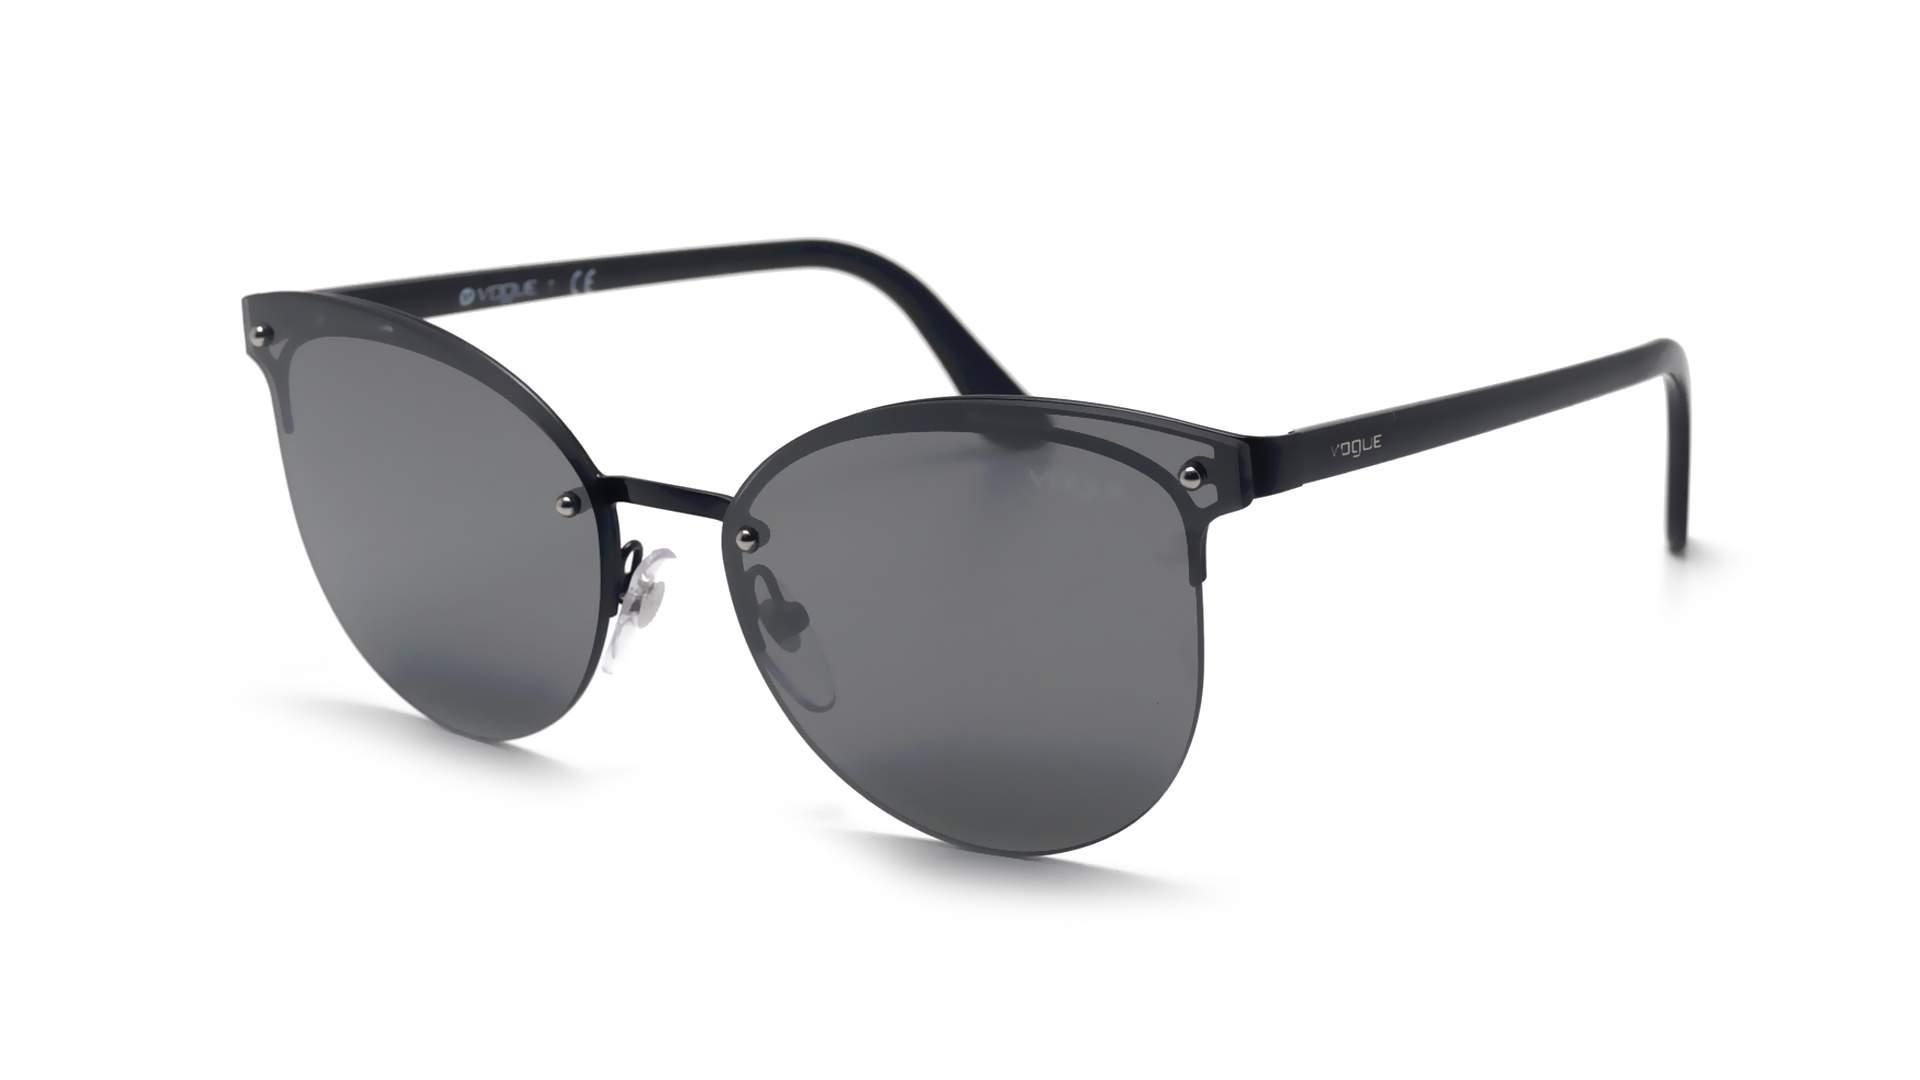 bbd4fc7b94b Sunglasses Vogue Metallic beat Black VO4089S 352 6G 60-16 Large Mirror